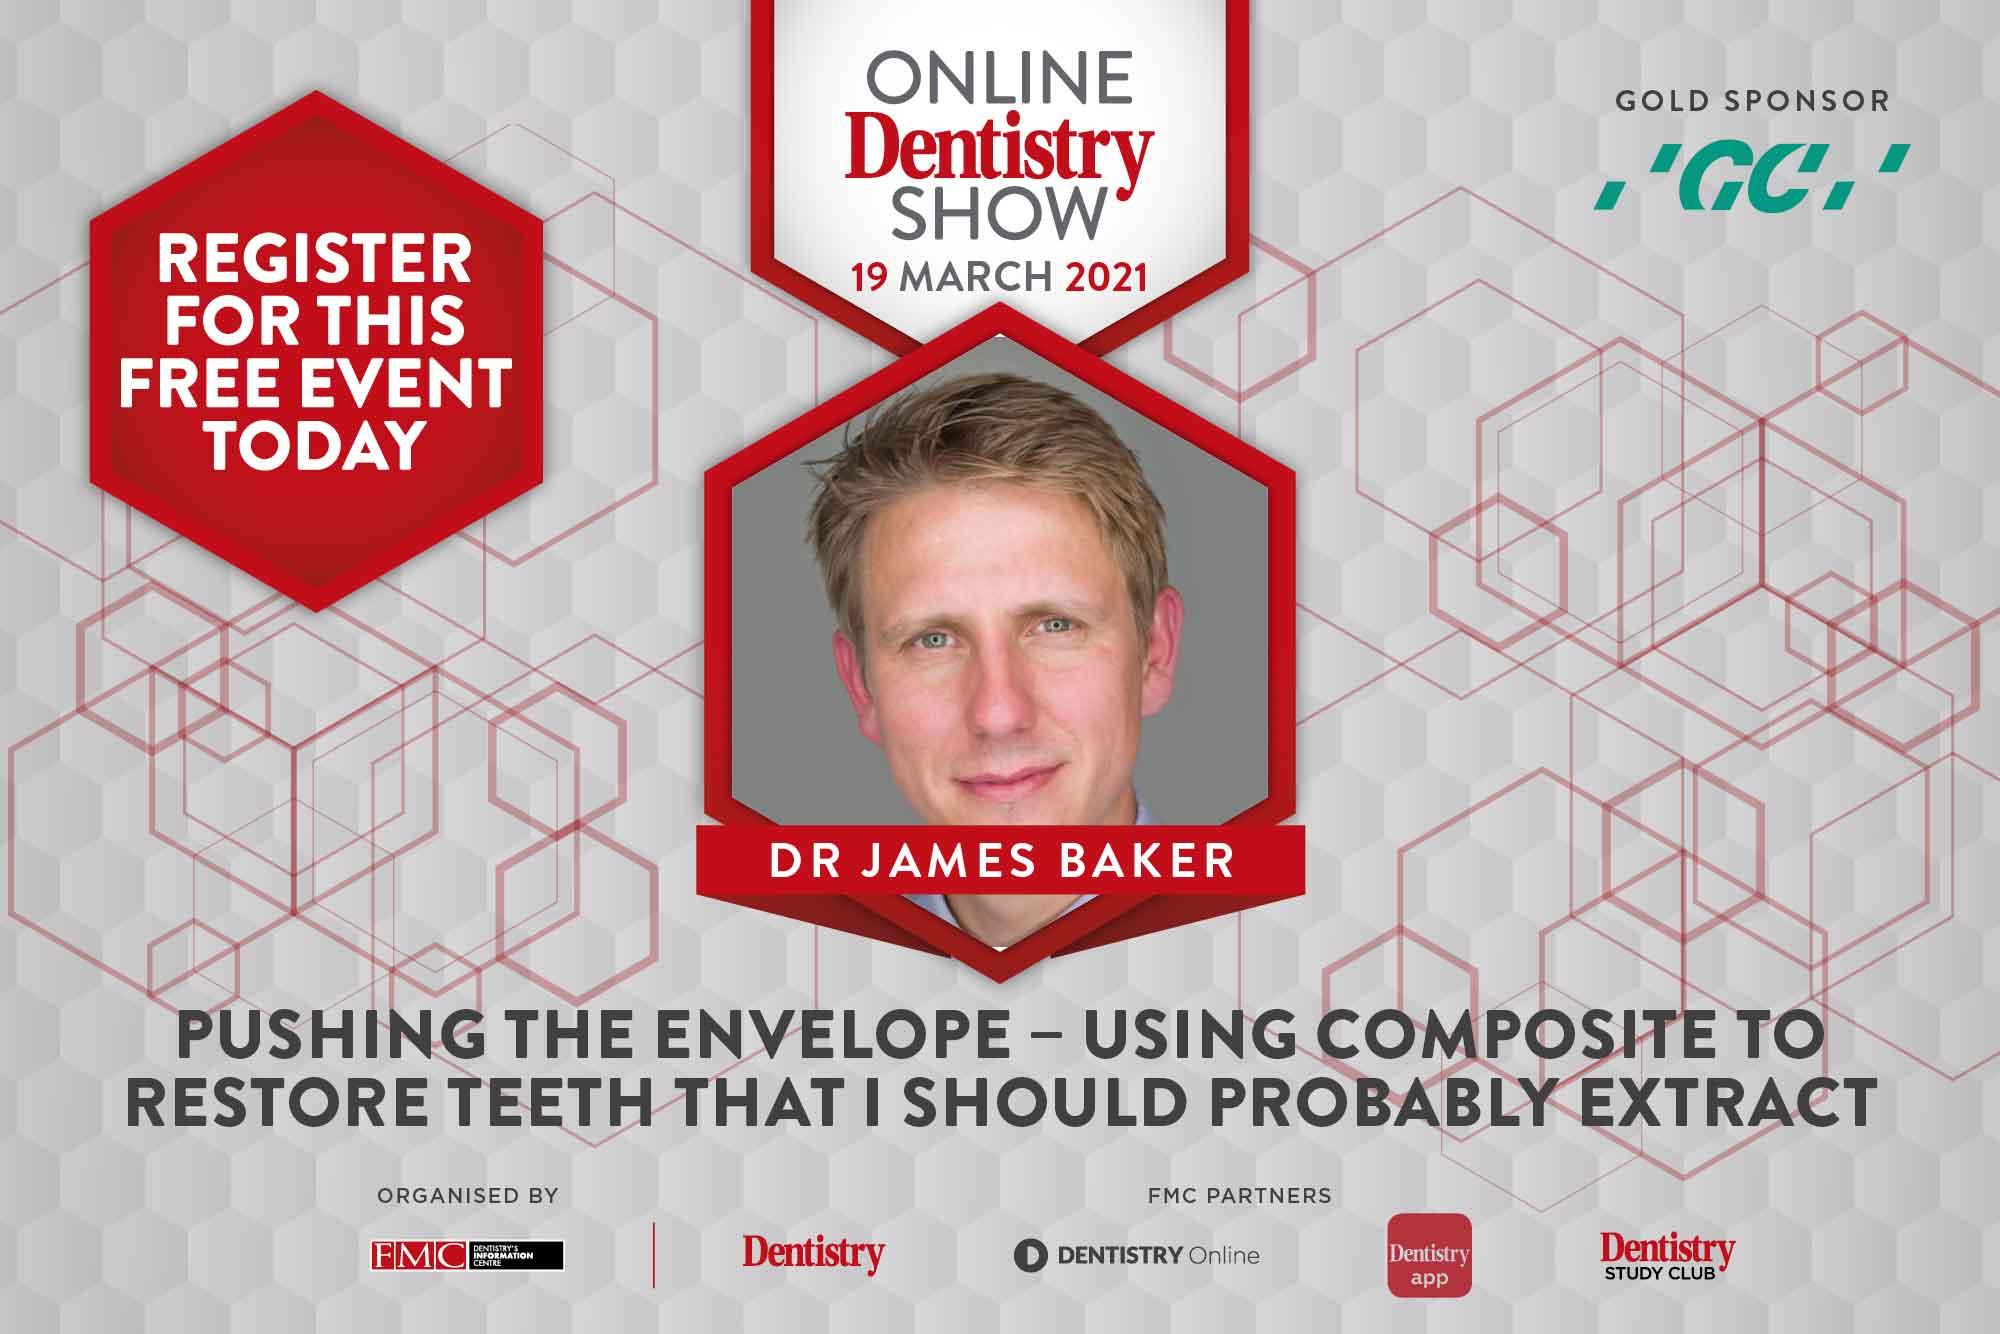 online dentistry show James Baker